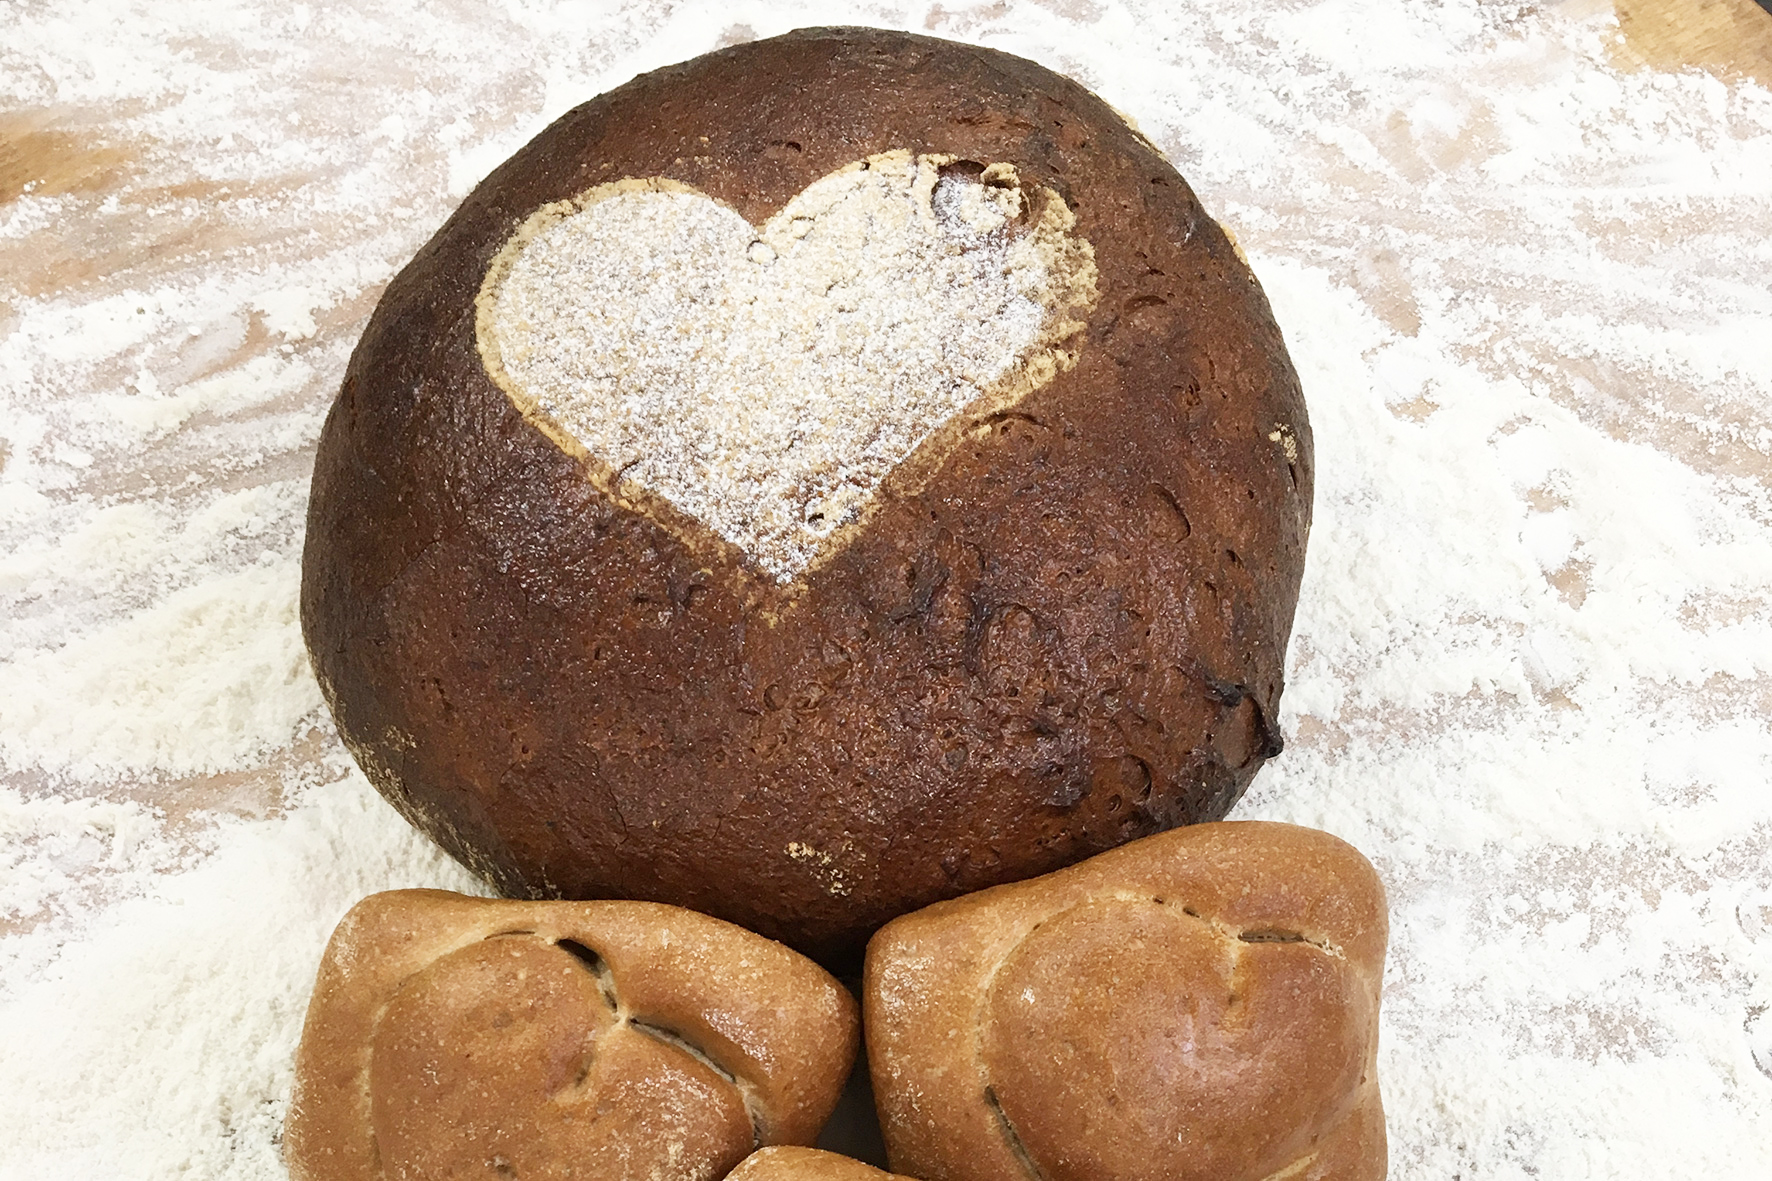 Bäcker unterstützt Ausstellung